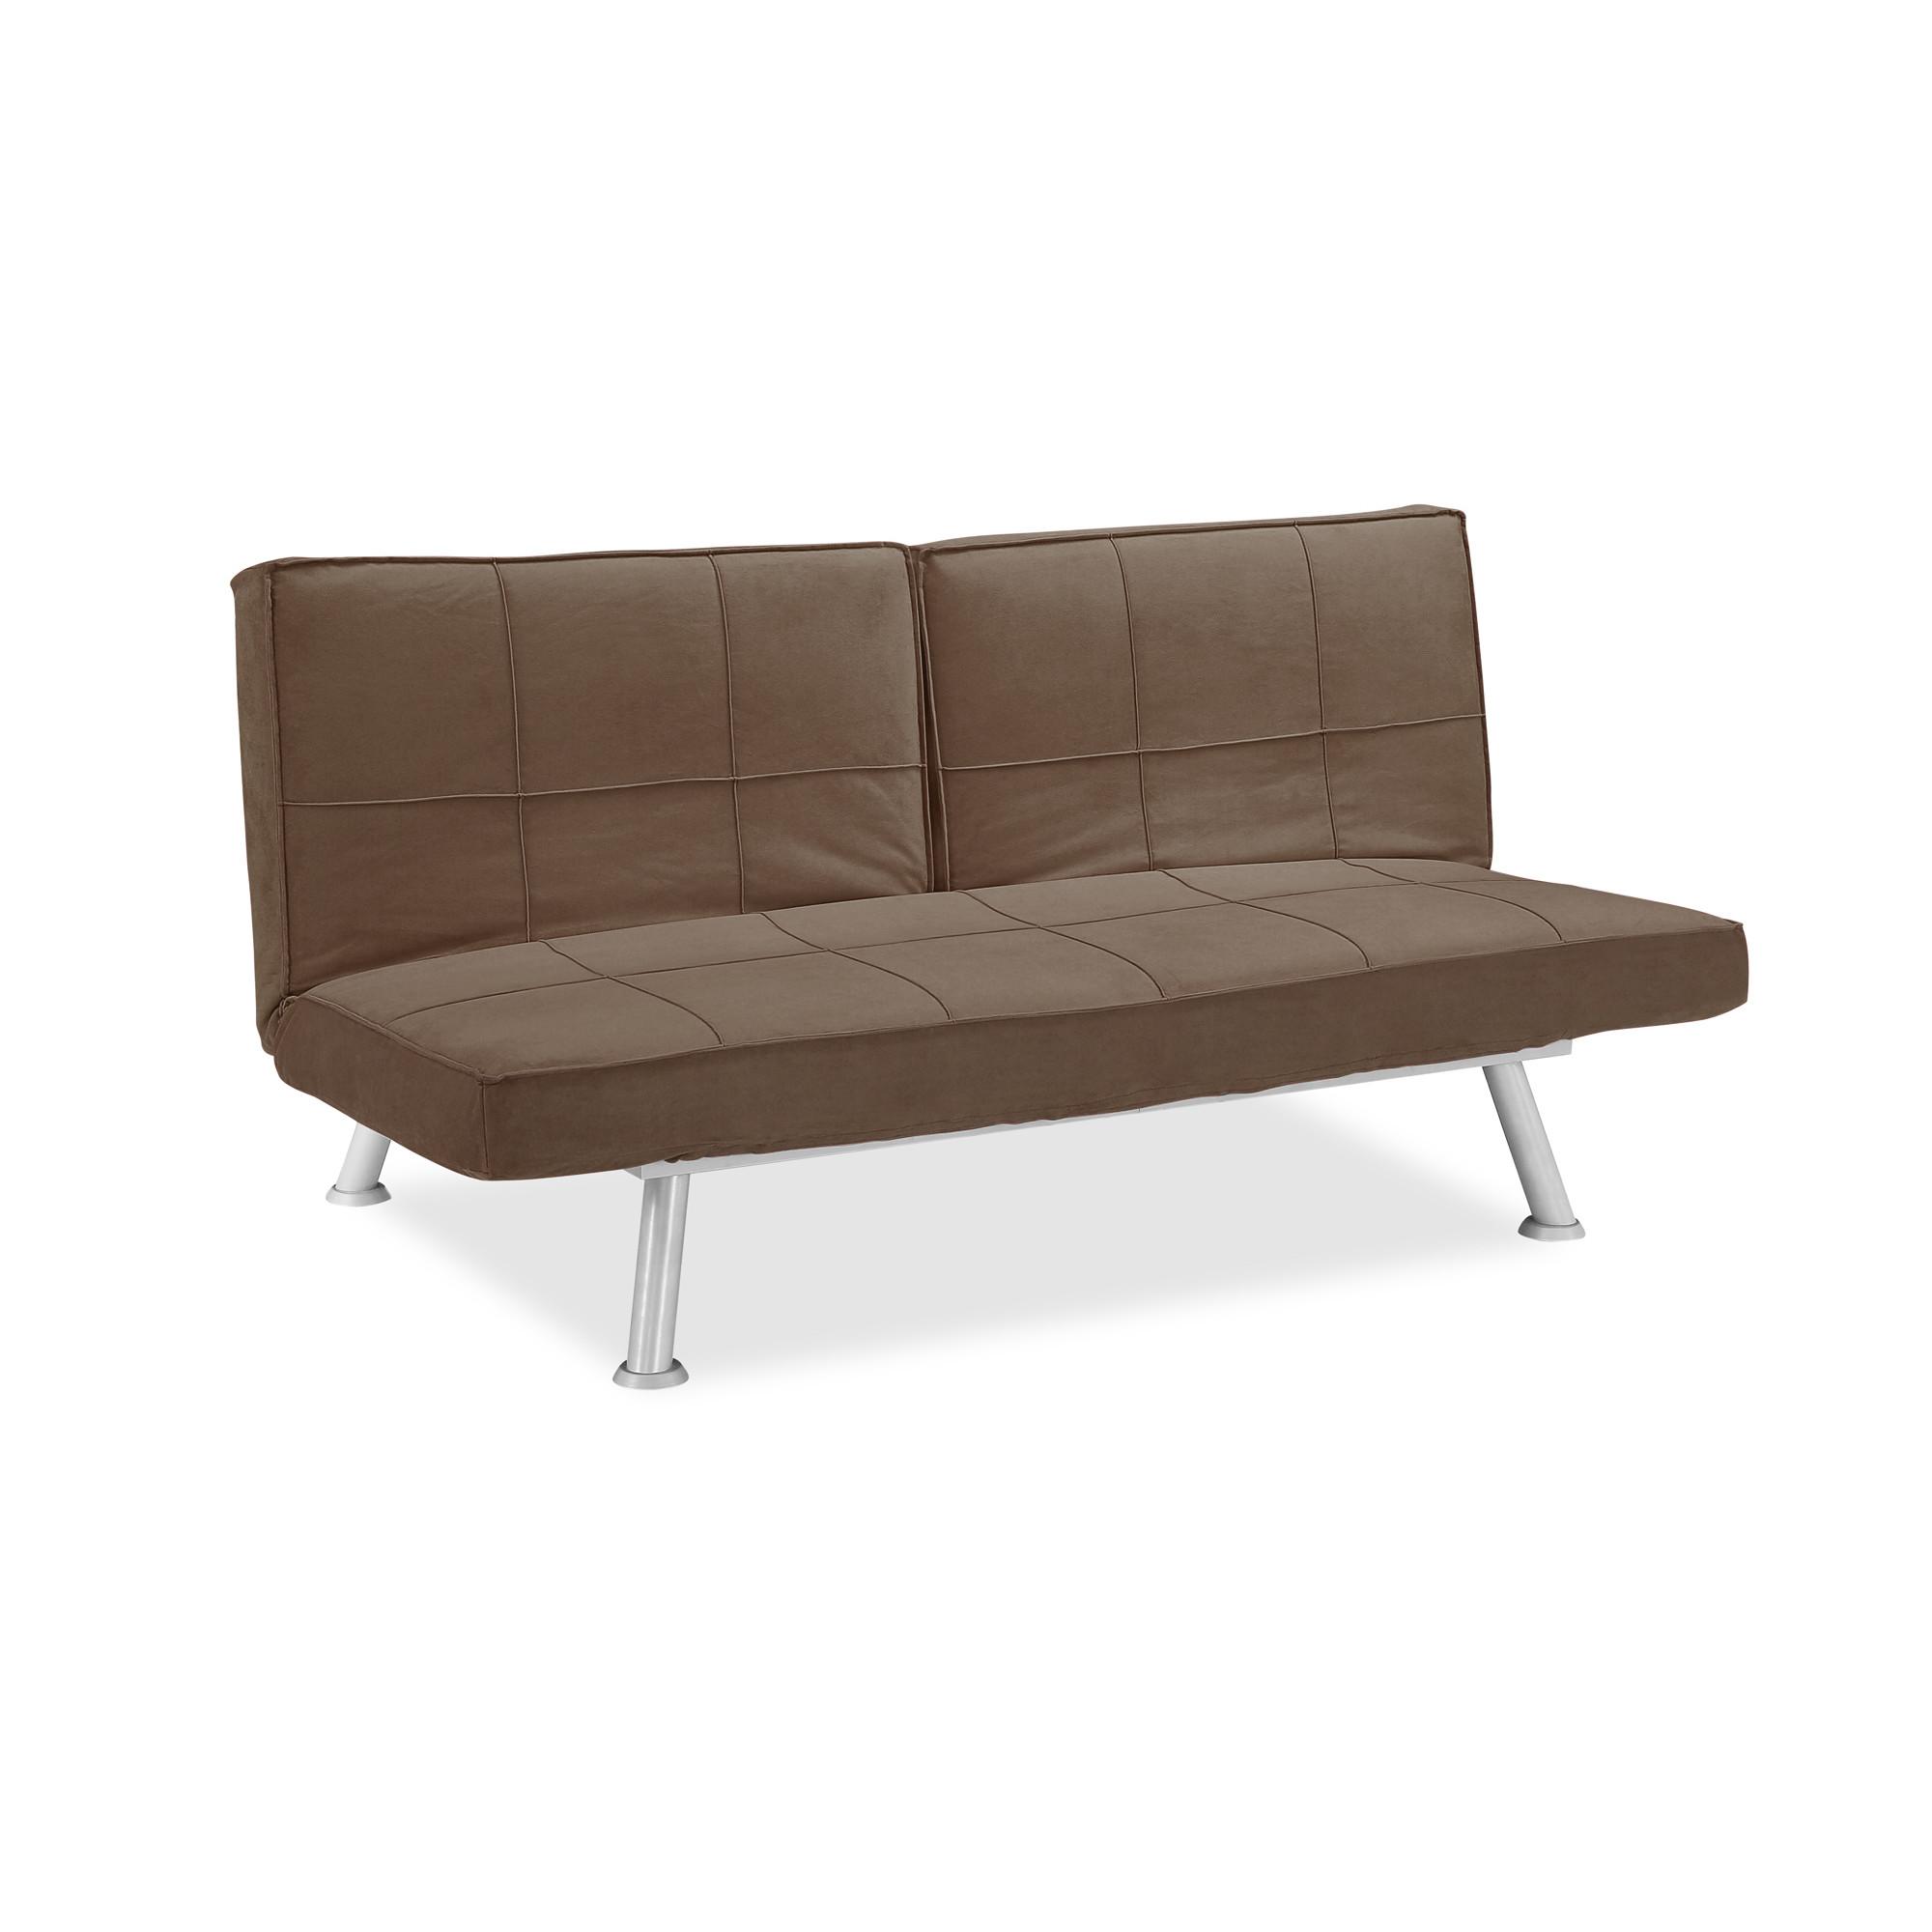 Maxson convertible sofa java by serta lifestyle for Sofa convertible 2 places